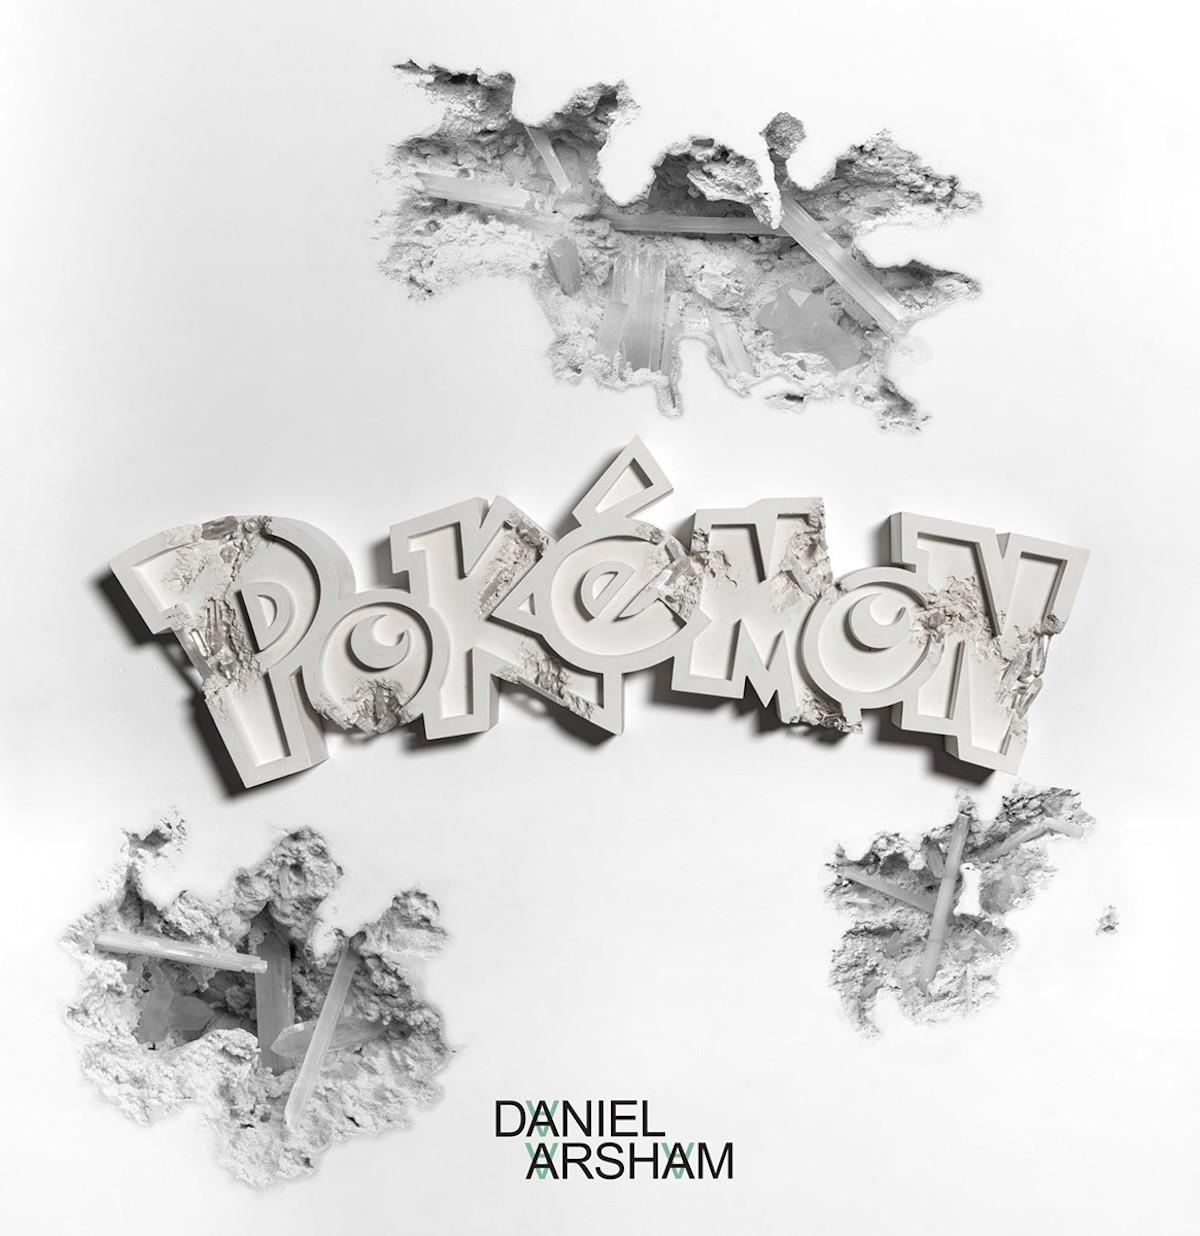 Daniel Arsham's POKÉMON Capsule Collab with Uniqlo Drops Online